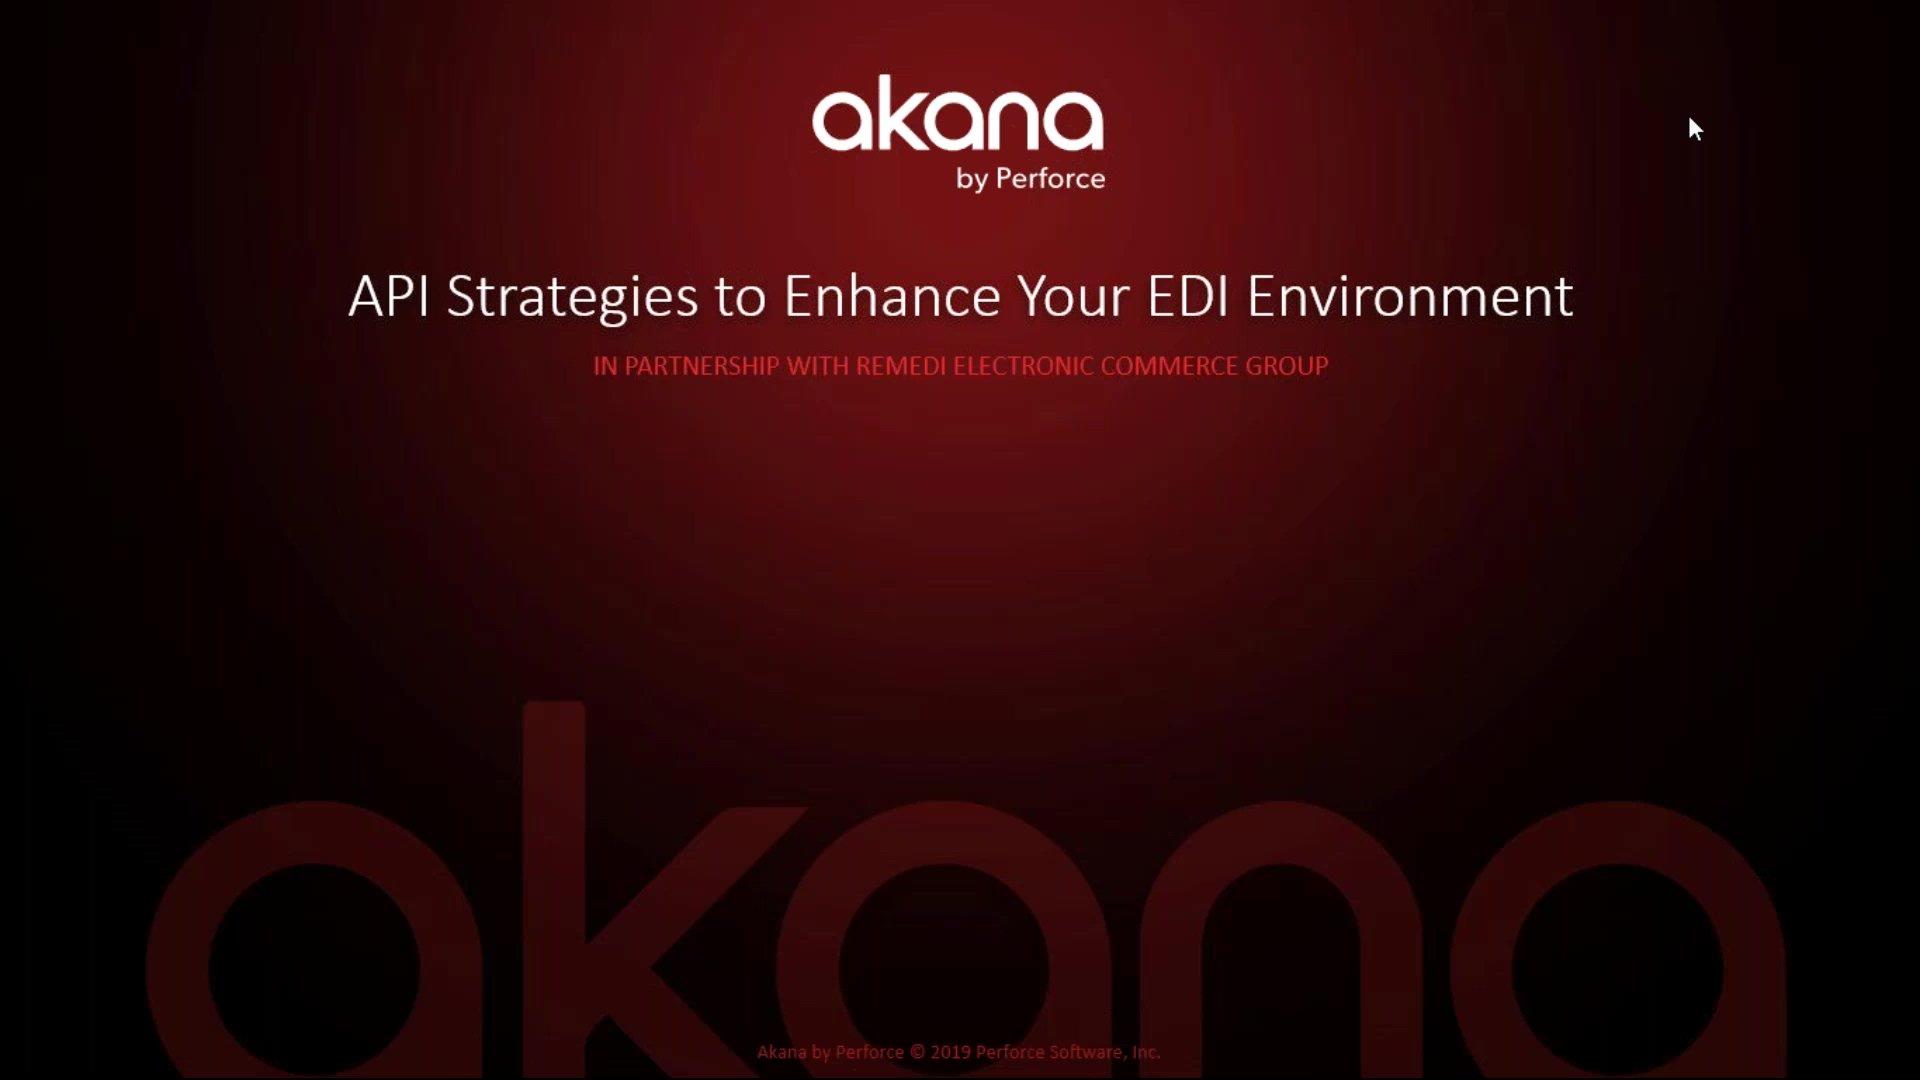 api-strategies-to-enhance-your-edi-environment